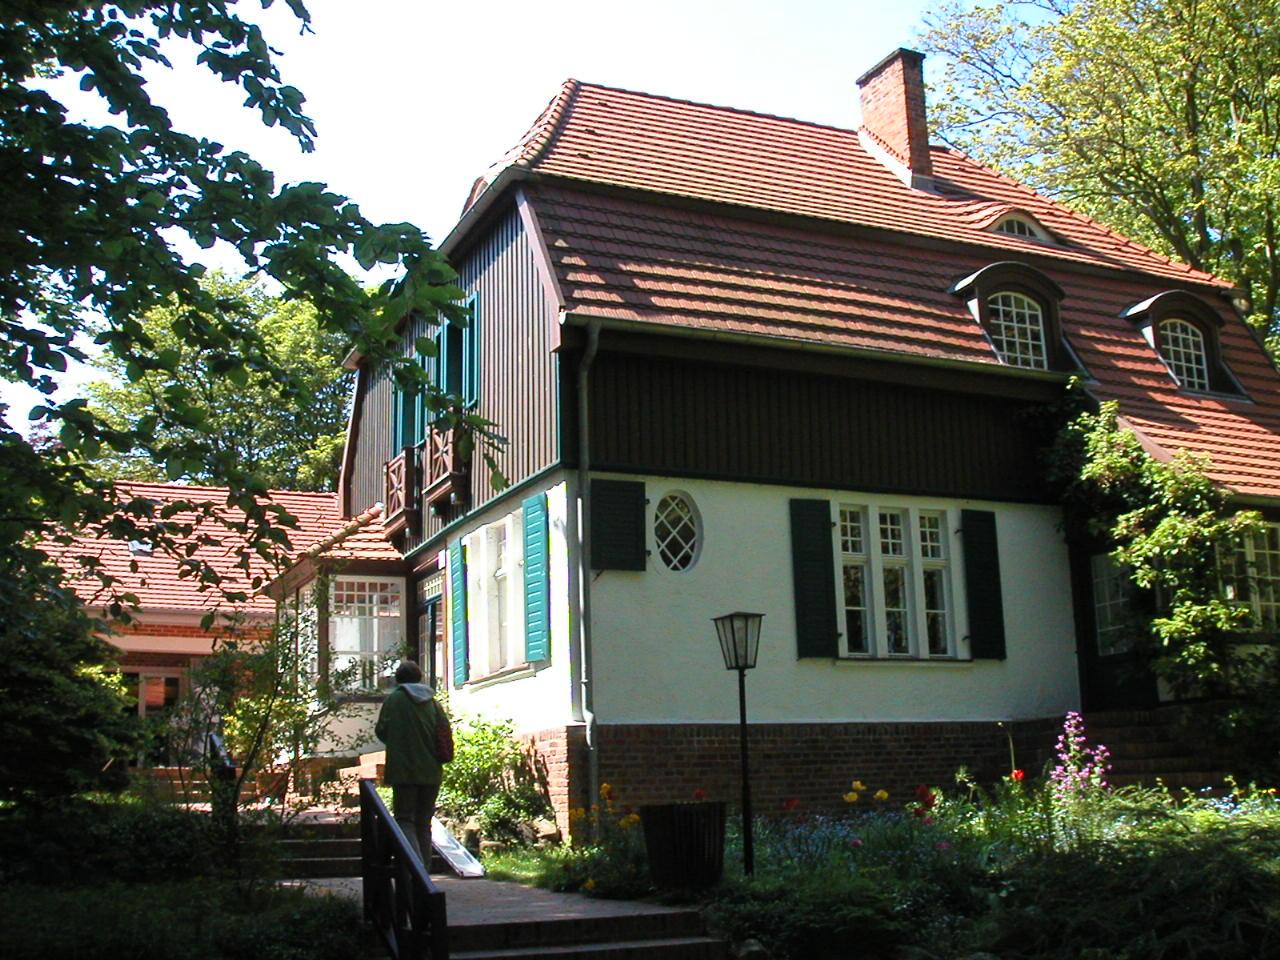 Bild Gerhart Hauptmann Haus Hiddensee